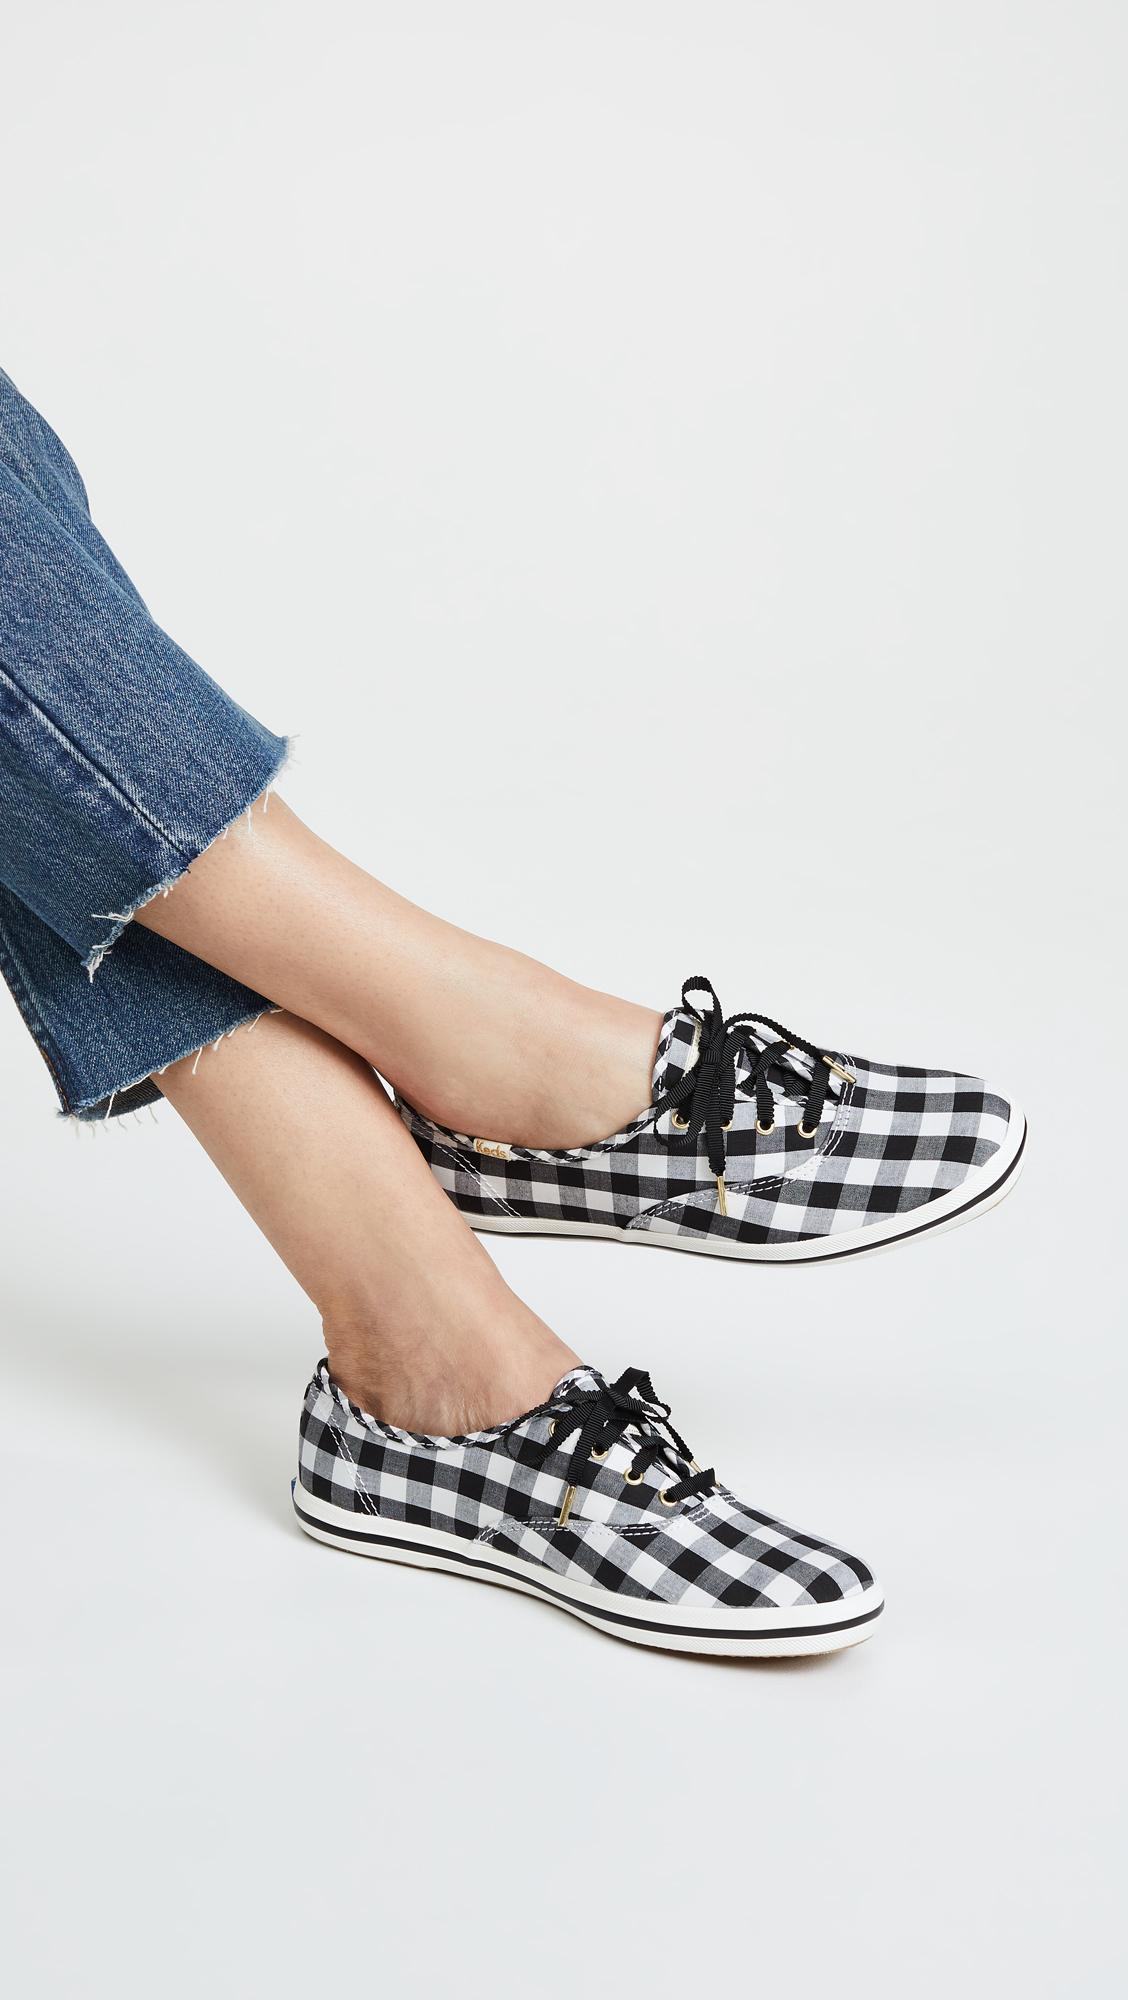 b2bec02e2b0 Keds x Kate Spade New York Gingham Sneakers